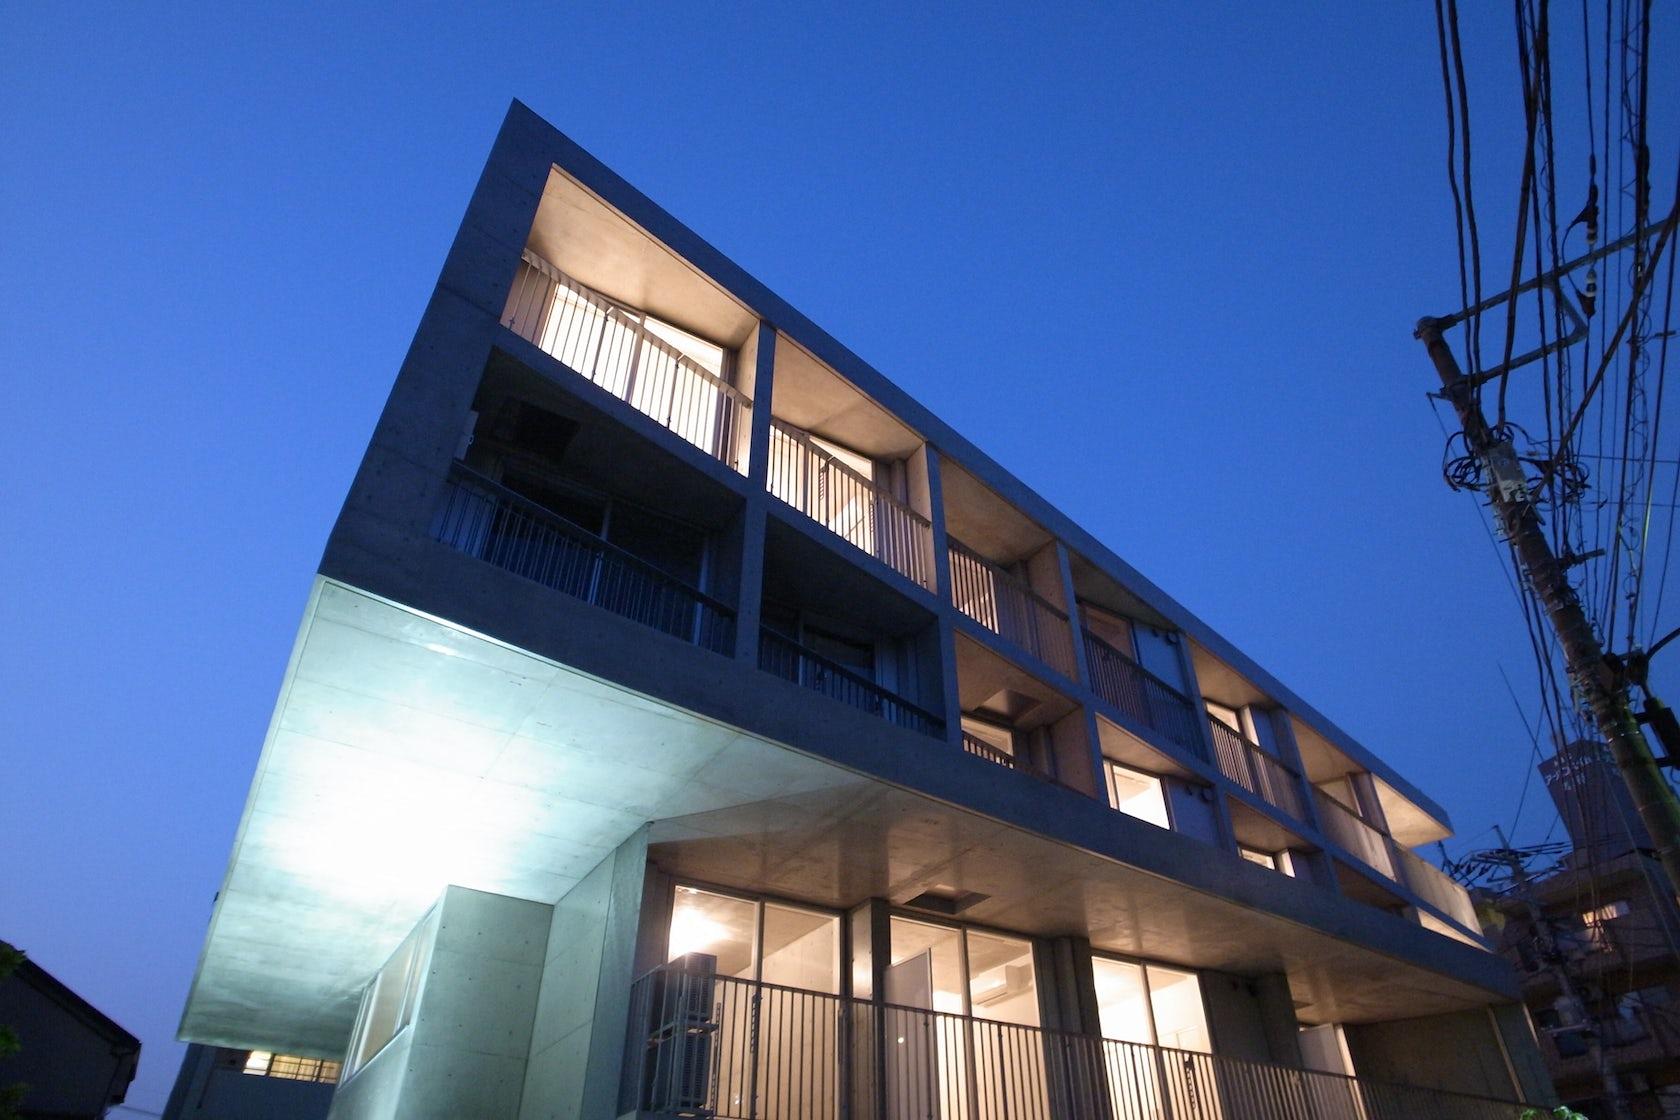 Hiroyuki moriyama architect and associates inc architizer for Architecture companies in nyc